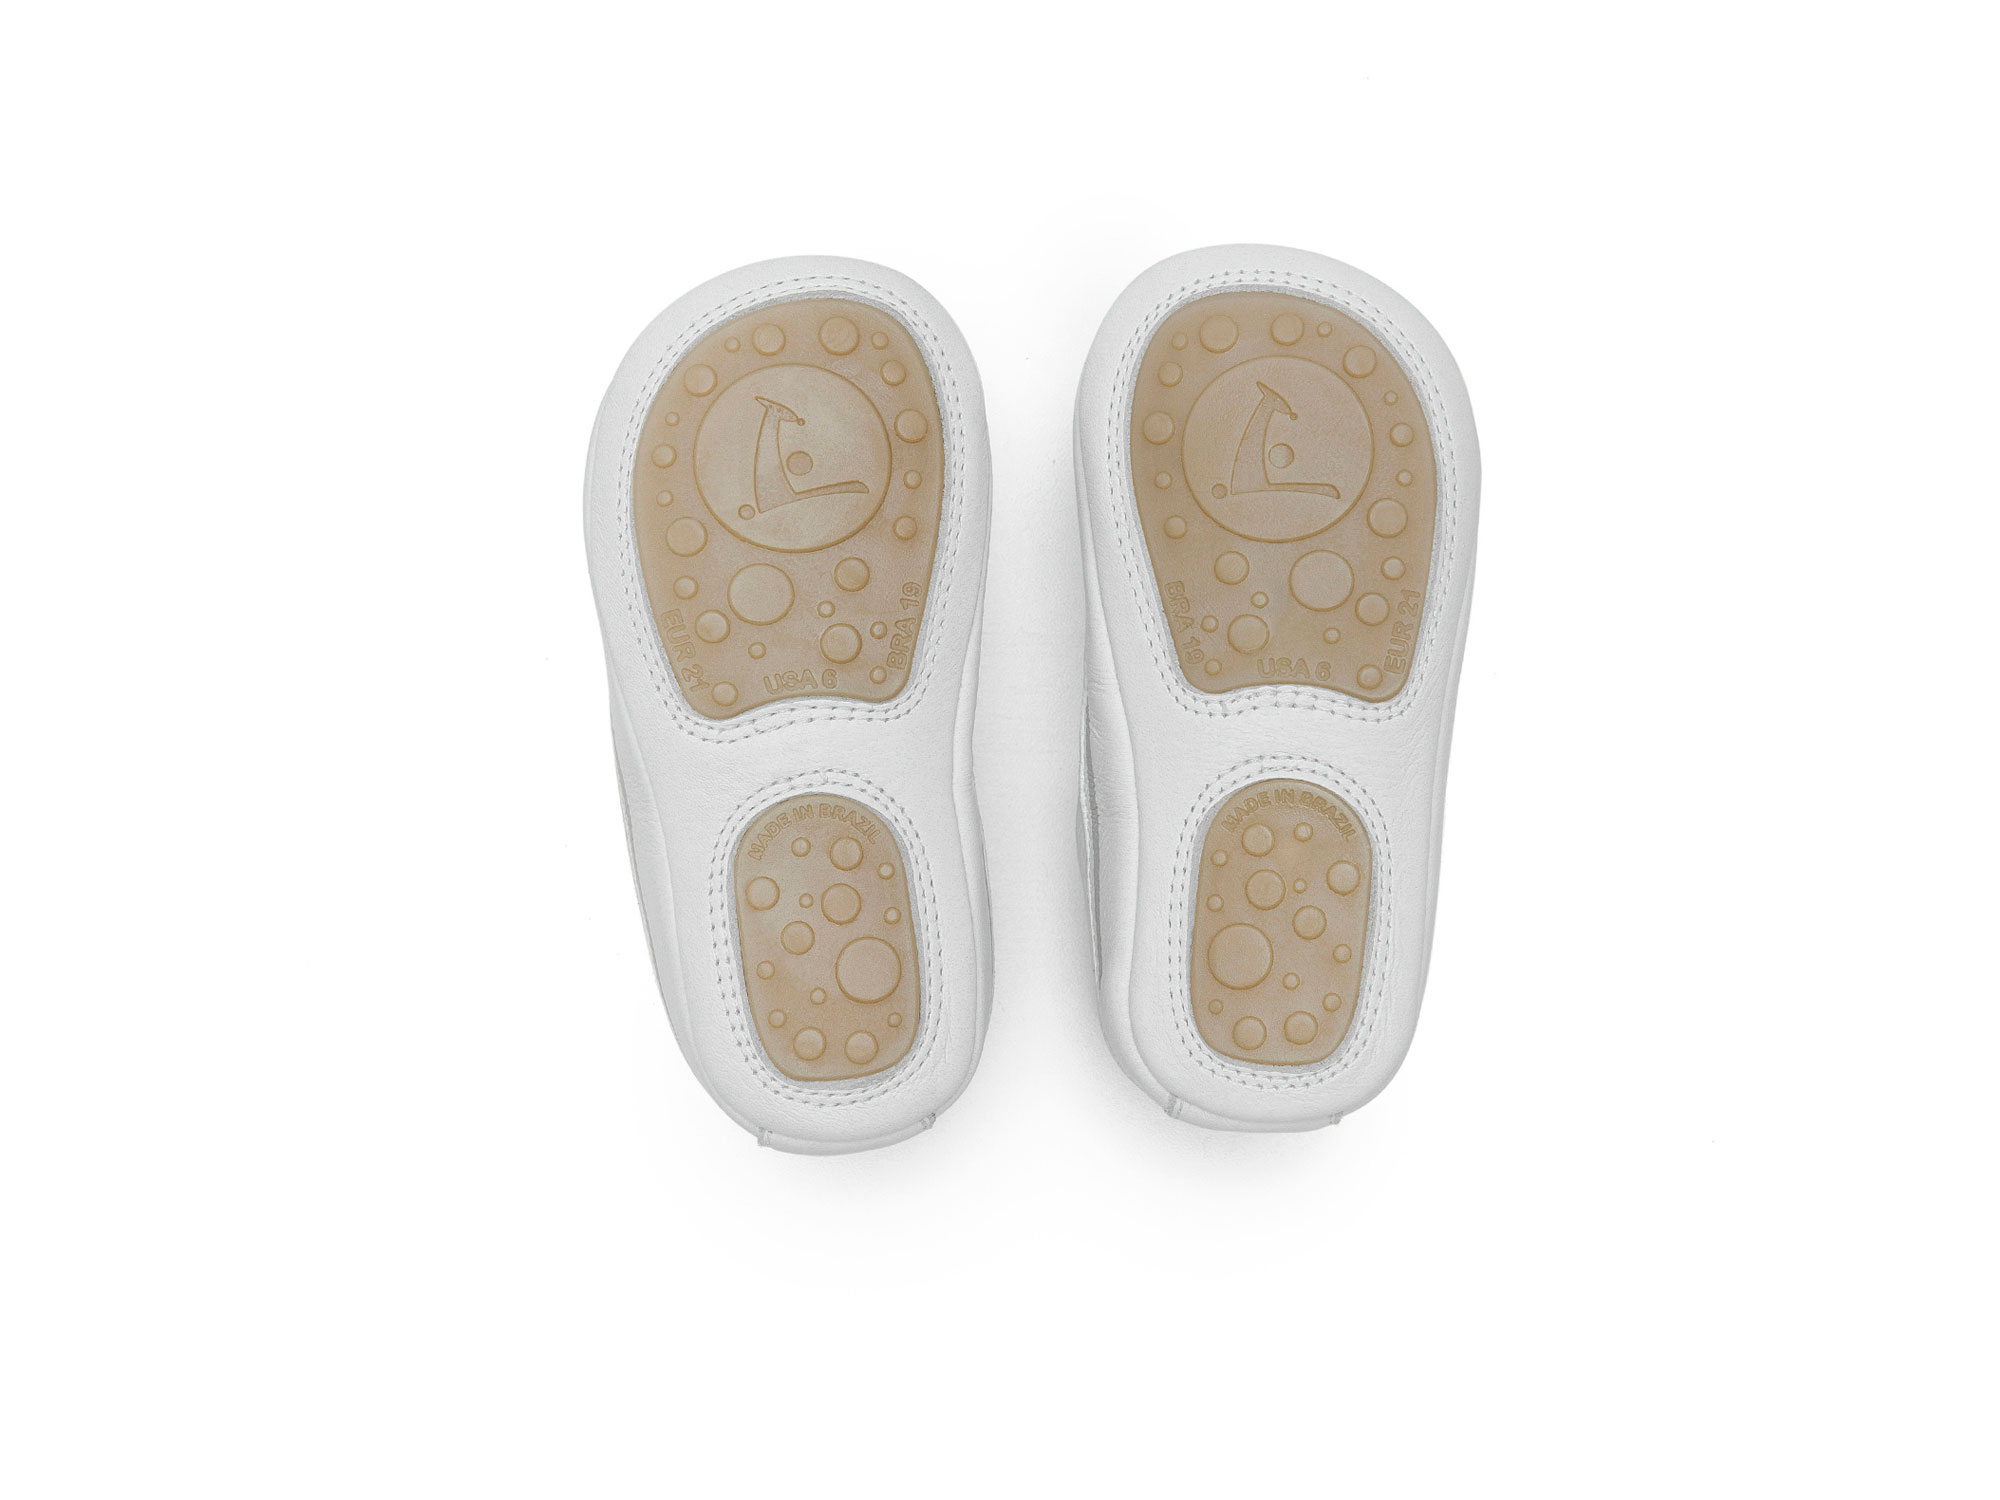 Tênis Funky White/ White  Baby 0 à 2 anos - 3